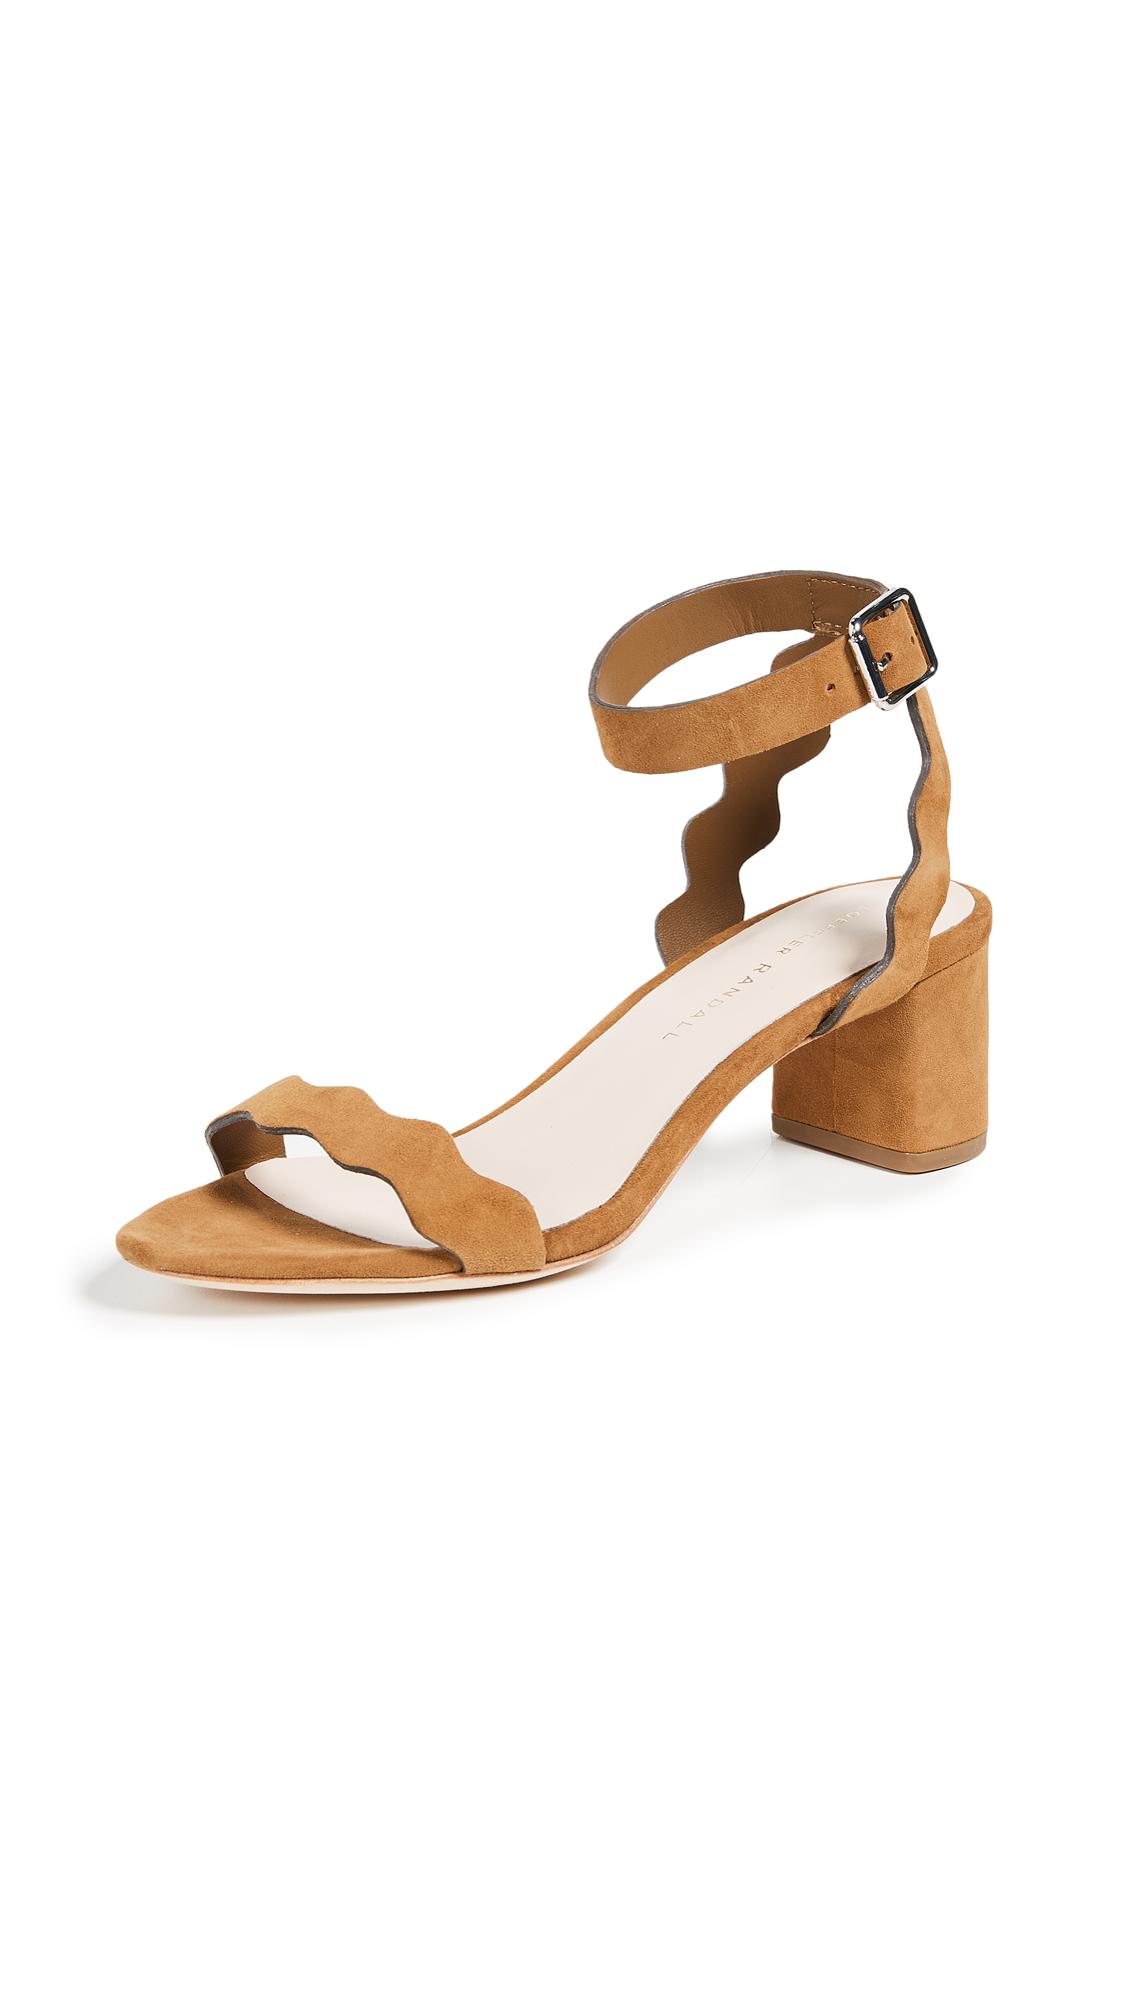 Loeffler Randall Emi Sandals - Sienna